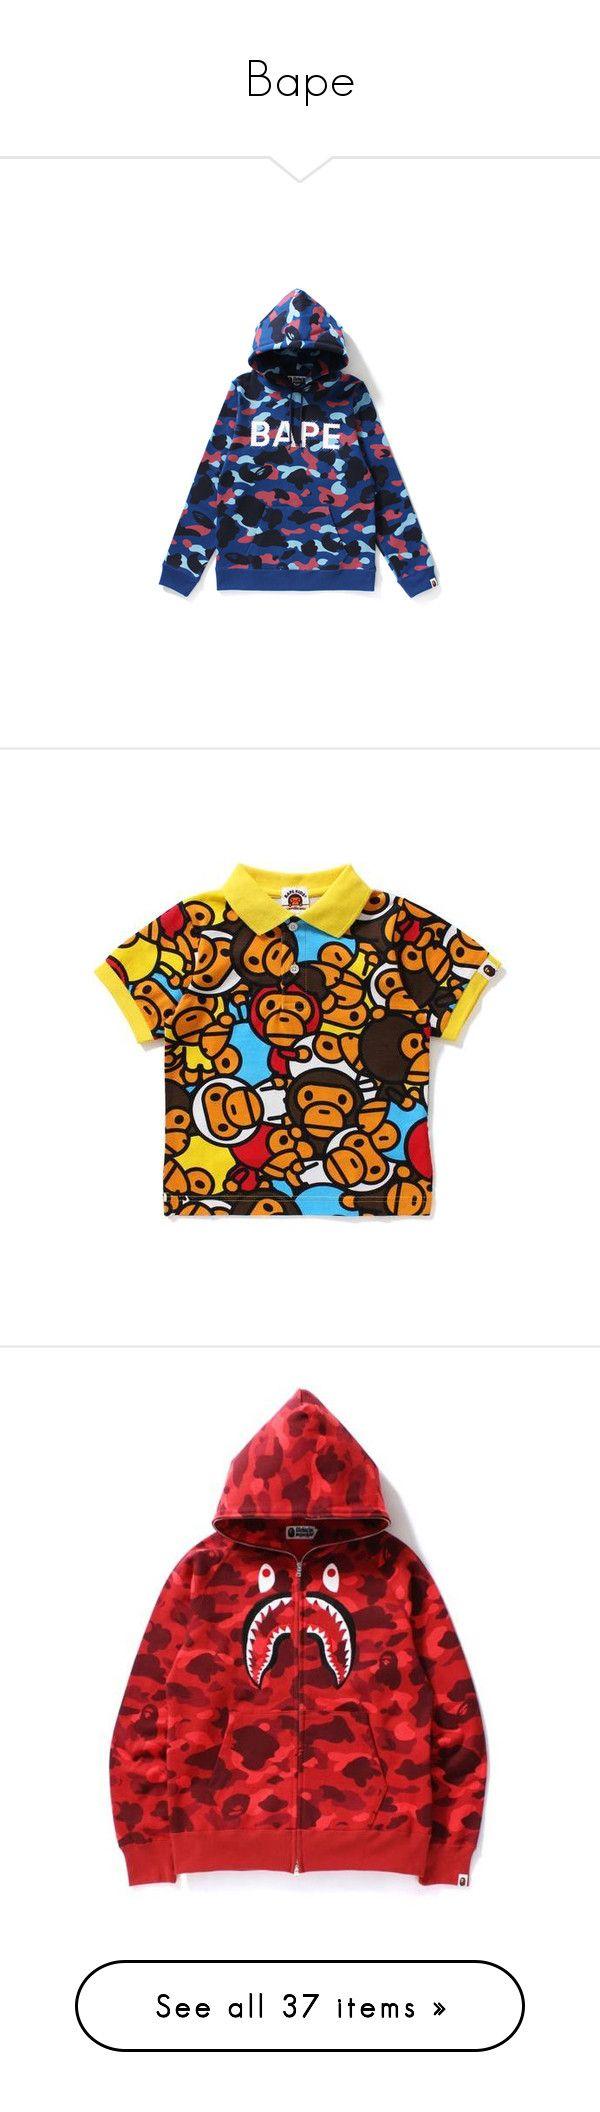 """Bape"" by sapringle ❤ liked on Polyvore featuring jackets, tops, hoodies, red top, streetwear hoodies, camouflage hoodies, embroidered top, full zip hoodie, cotton hooded sweatshirt and camo hooded sweatshirt"